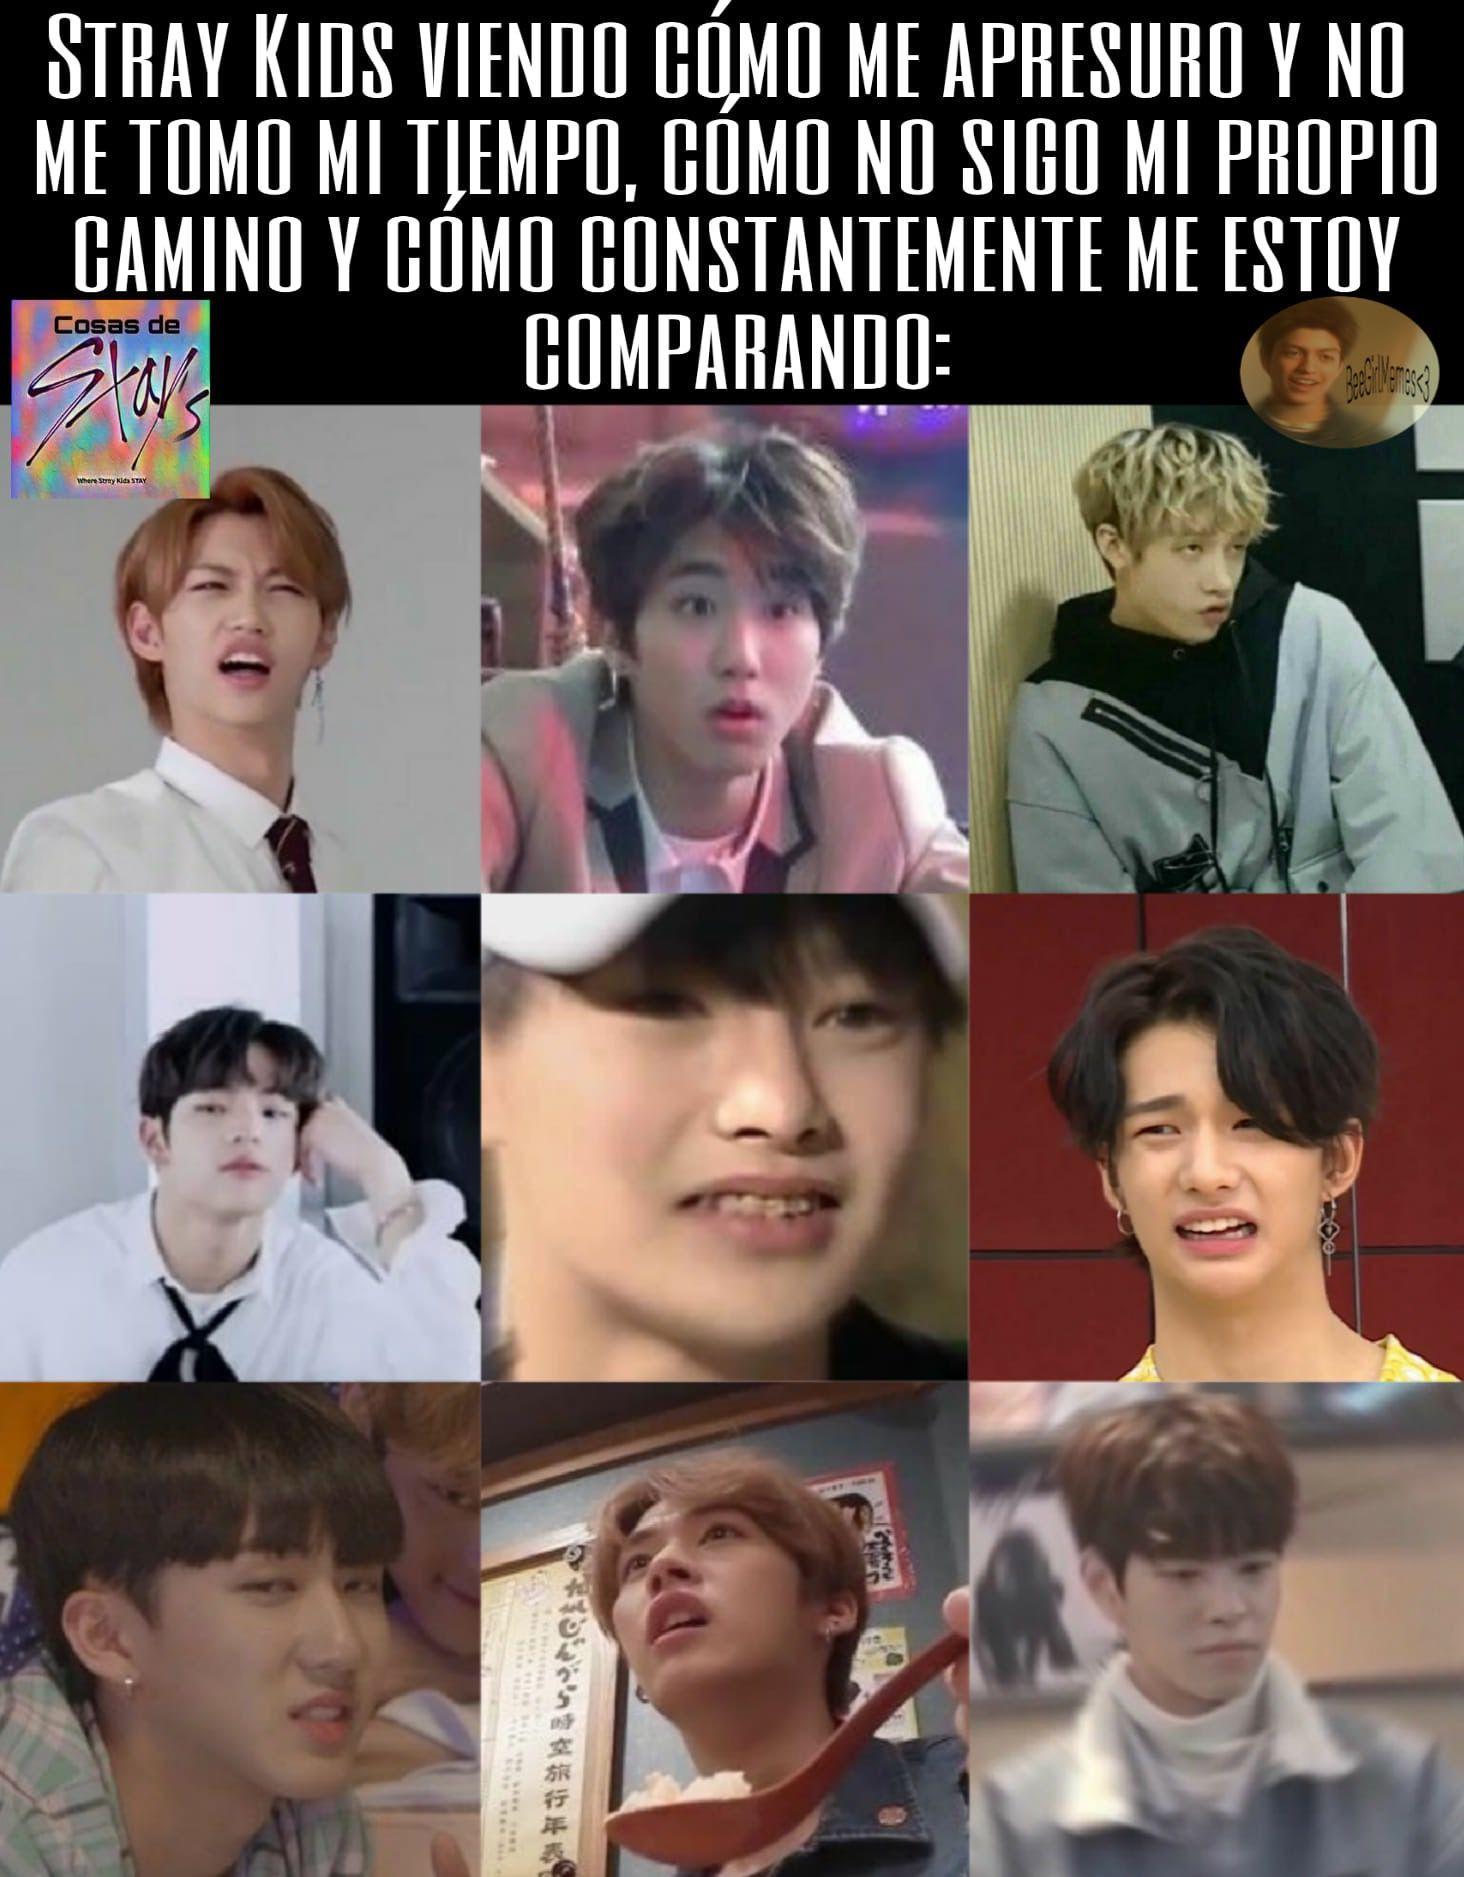 Memes De Stray Kids En 2020 Memes Memes Coreanos Memes Kpop